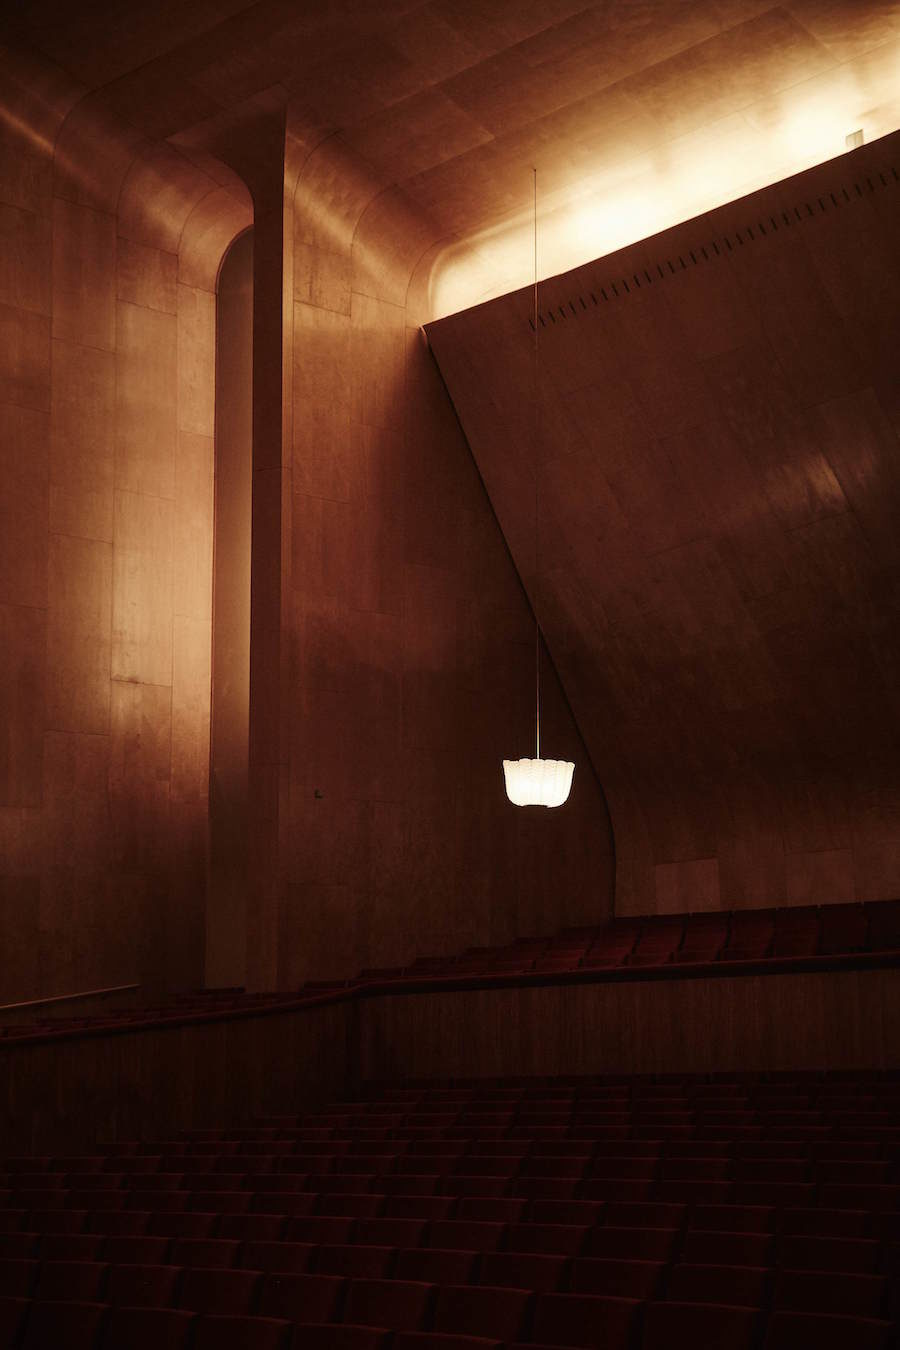 Ensam lampa i dunkel omgivning inne på Göteborgs Konserthus.